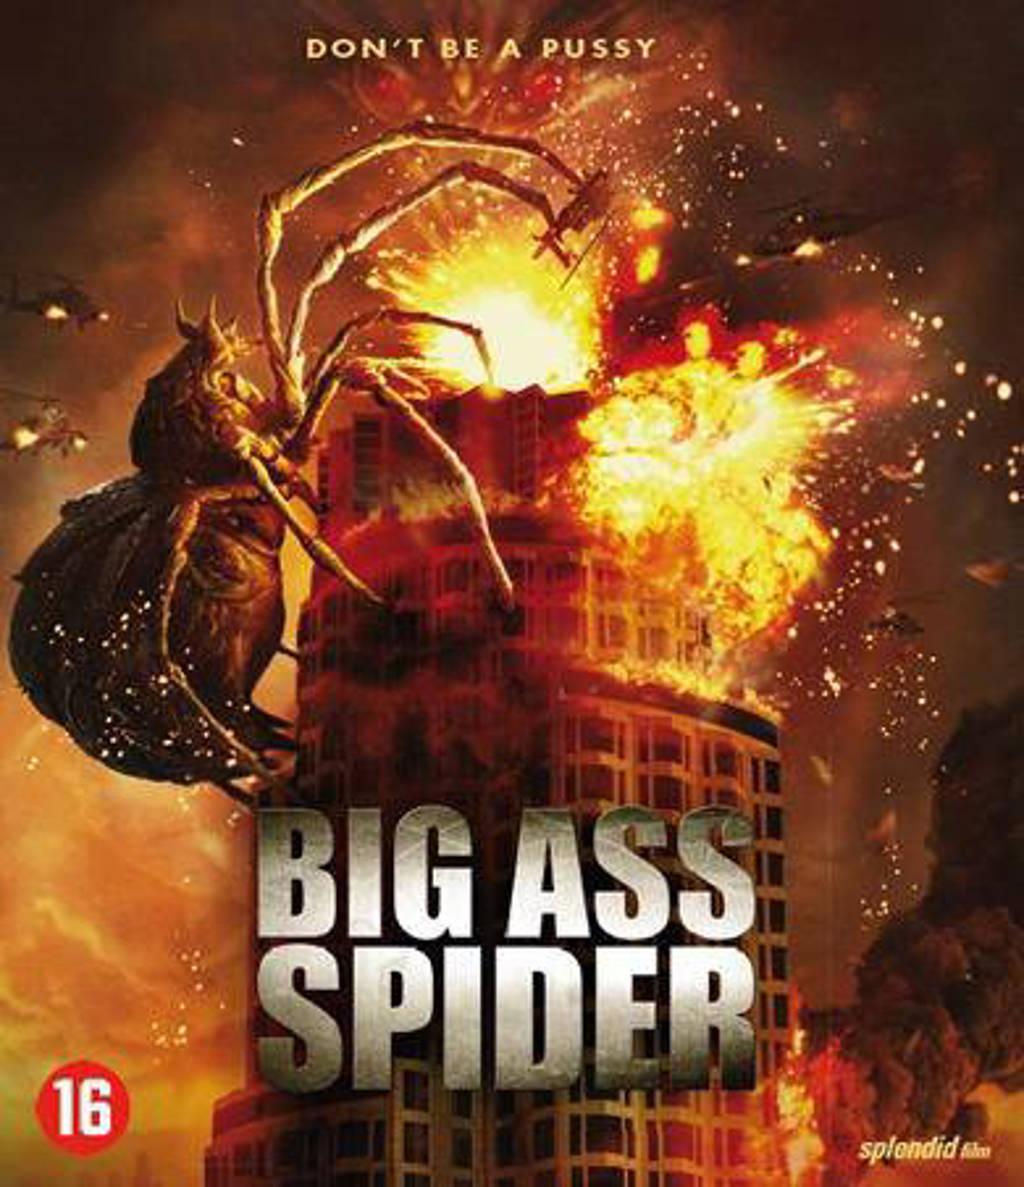 Big ass spider (Blu-ray)